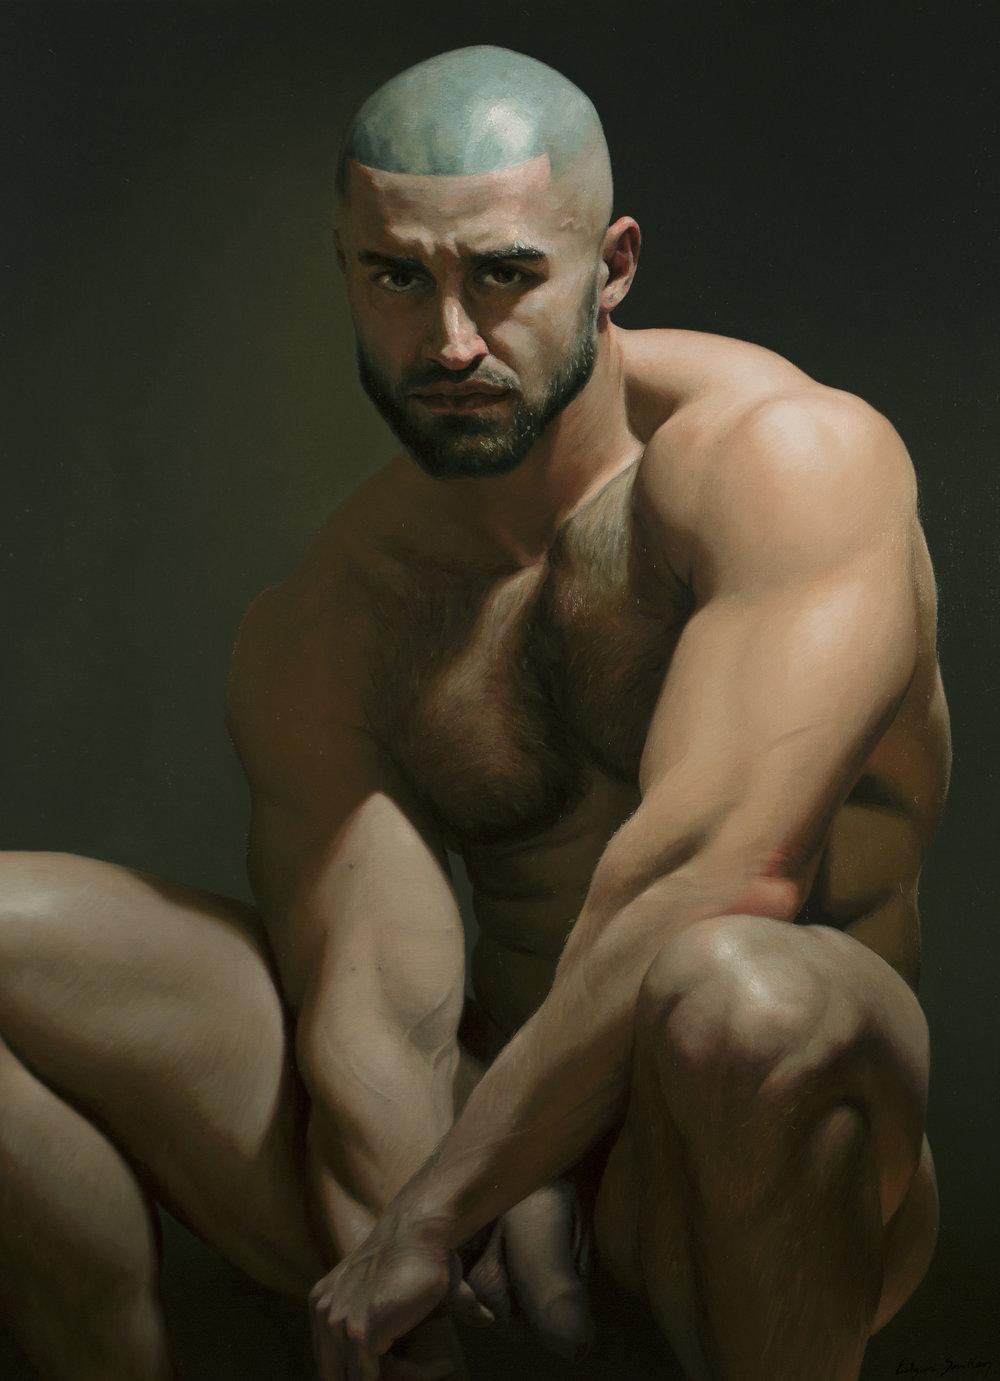 portrait-commande-francois-sagat-edgar-saillen.jpg